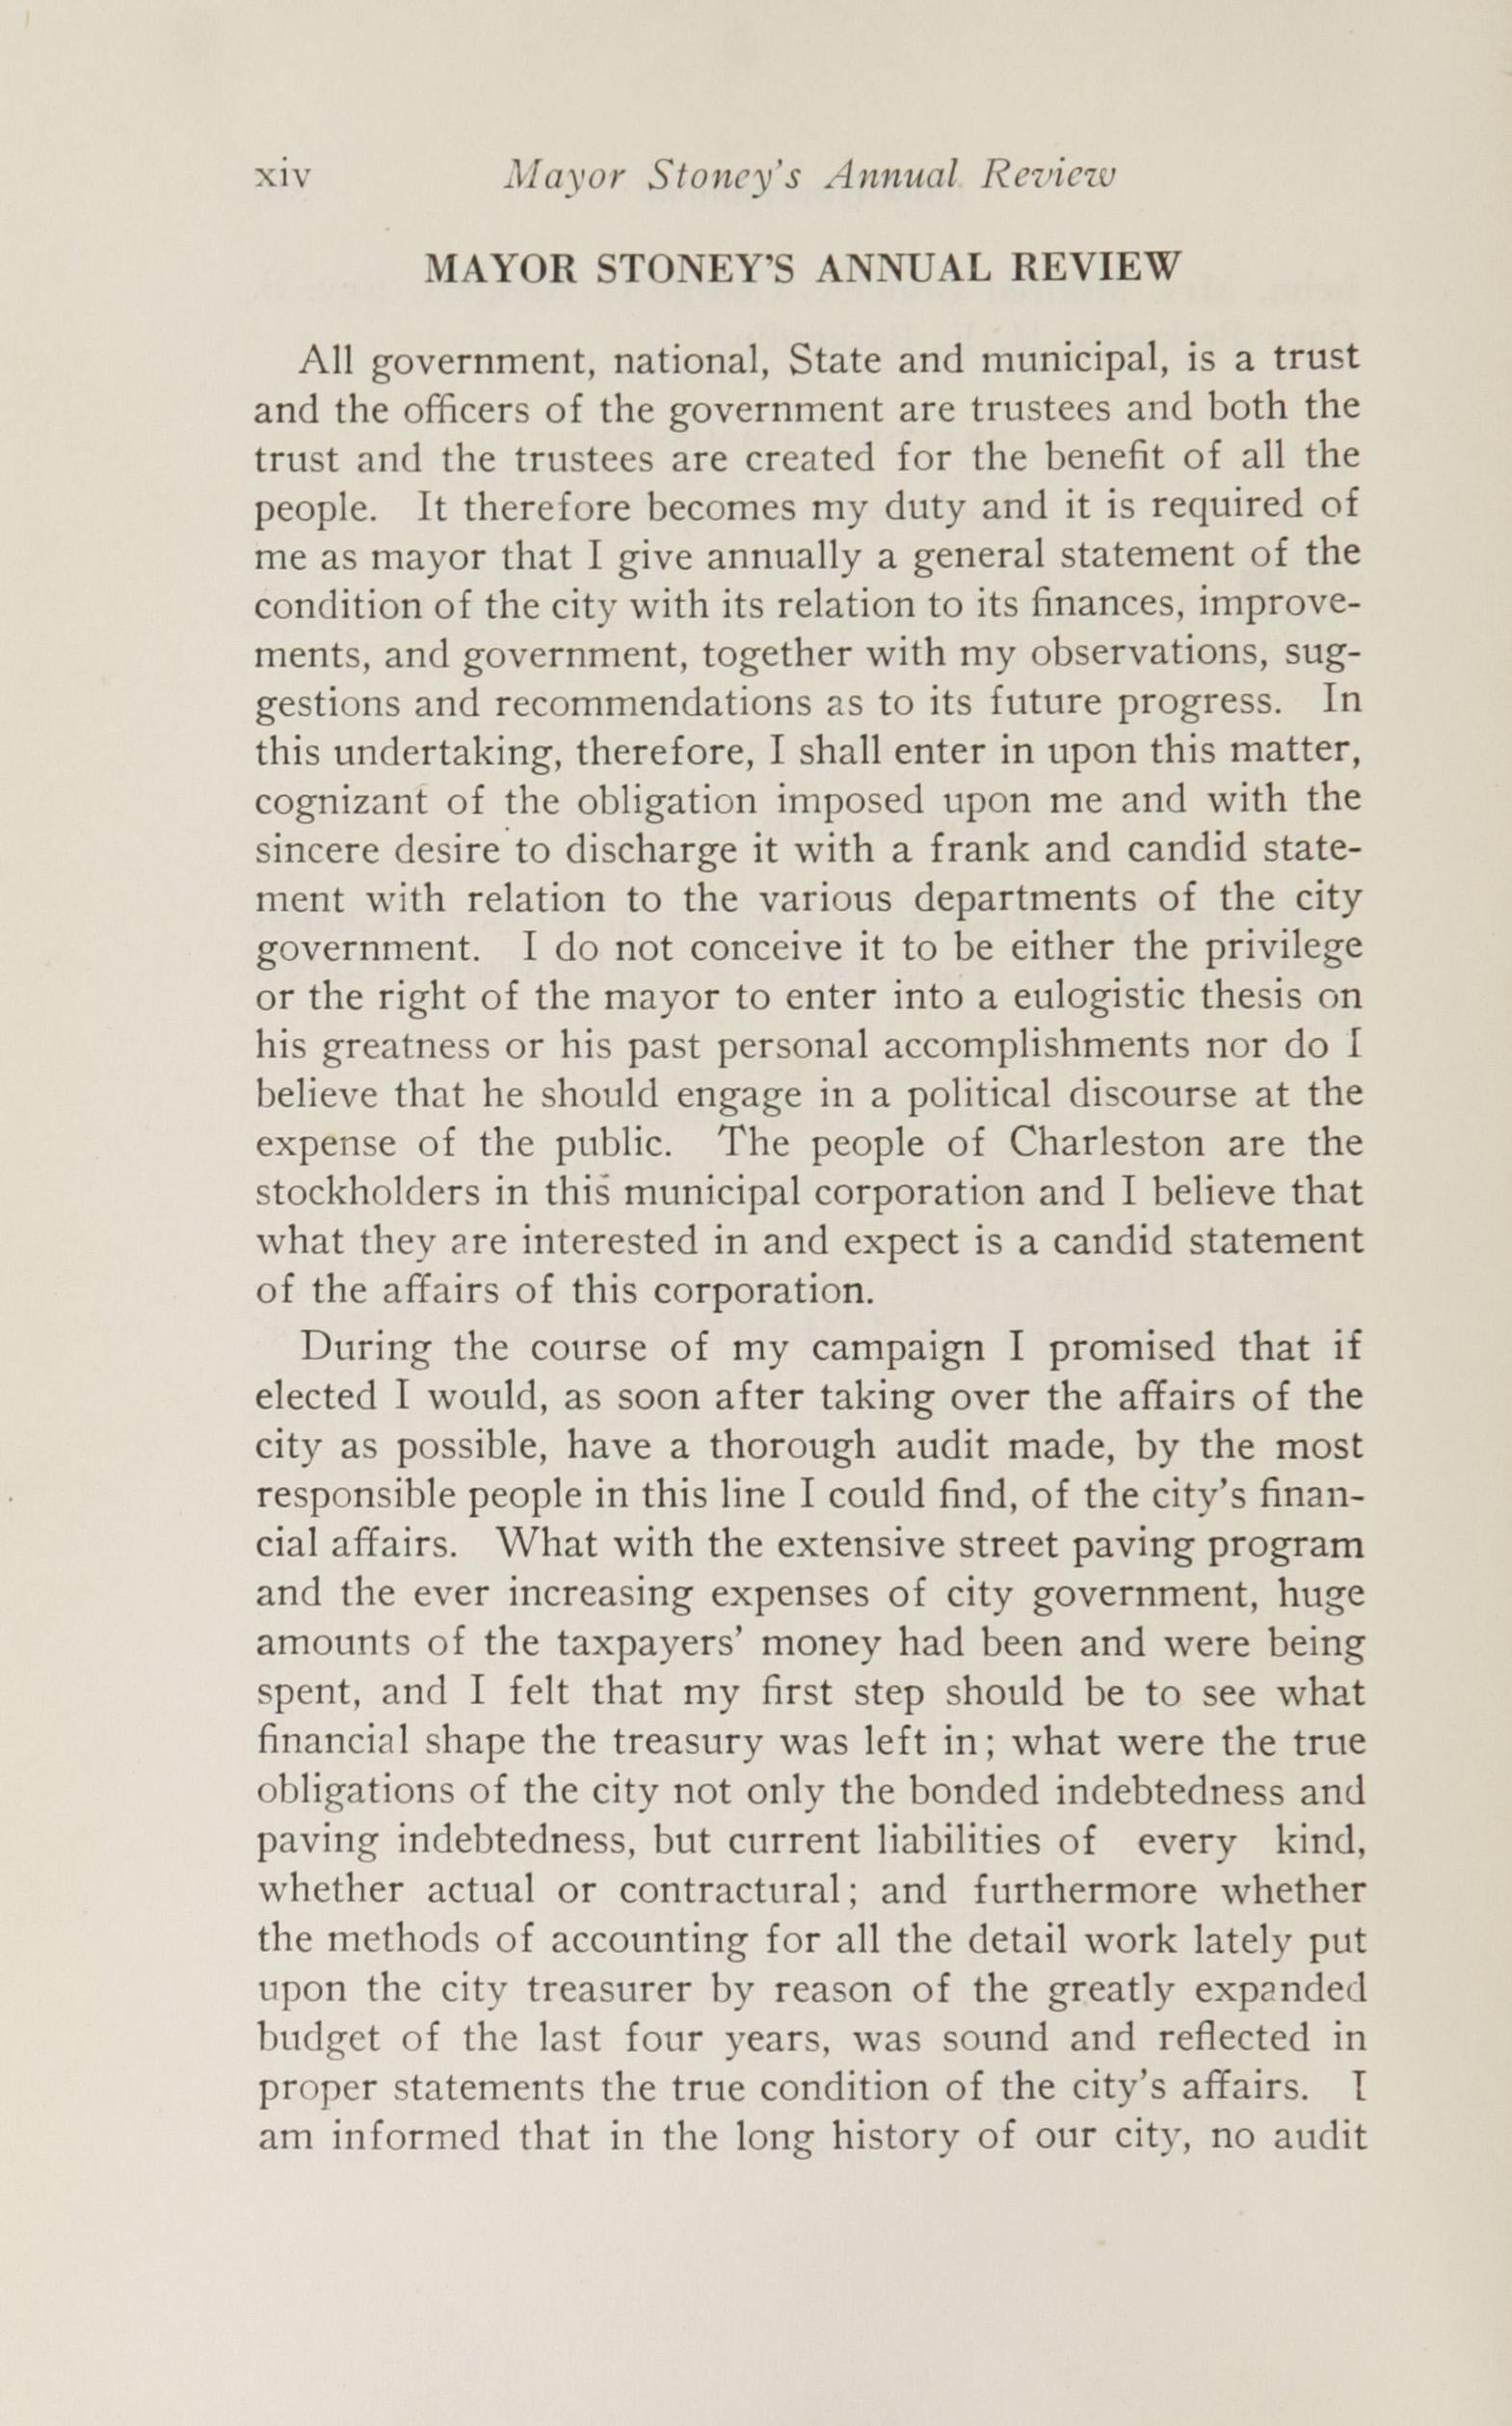 Charleston Yearbook, 1924, page xiv